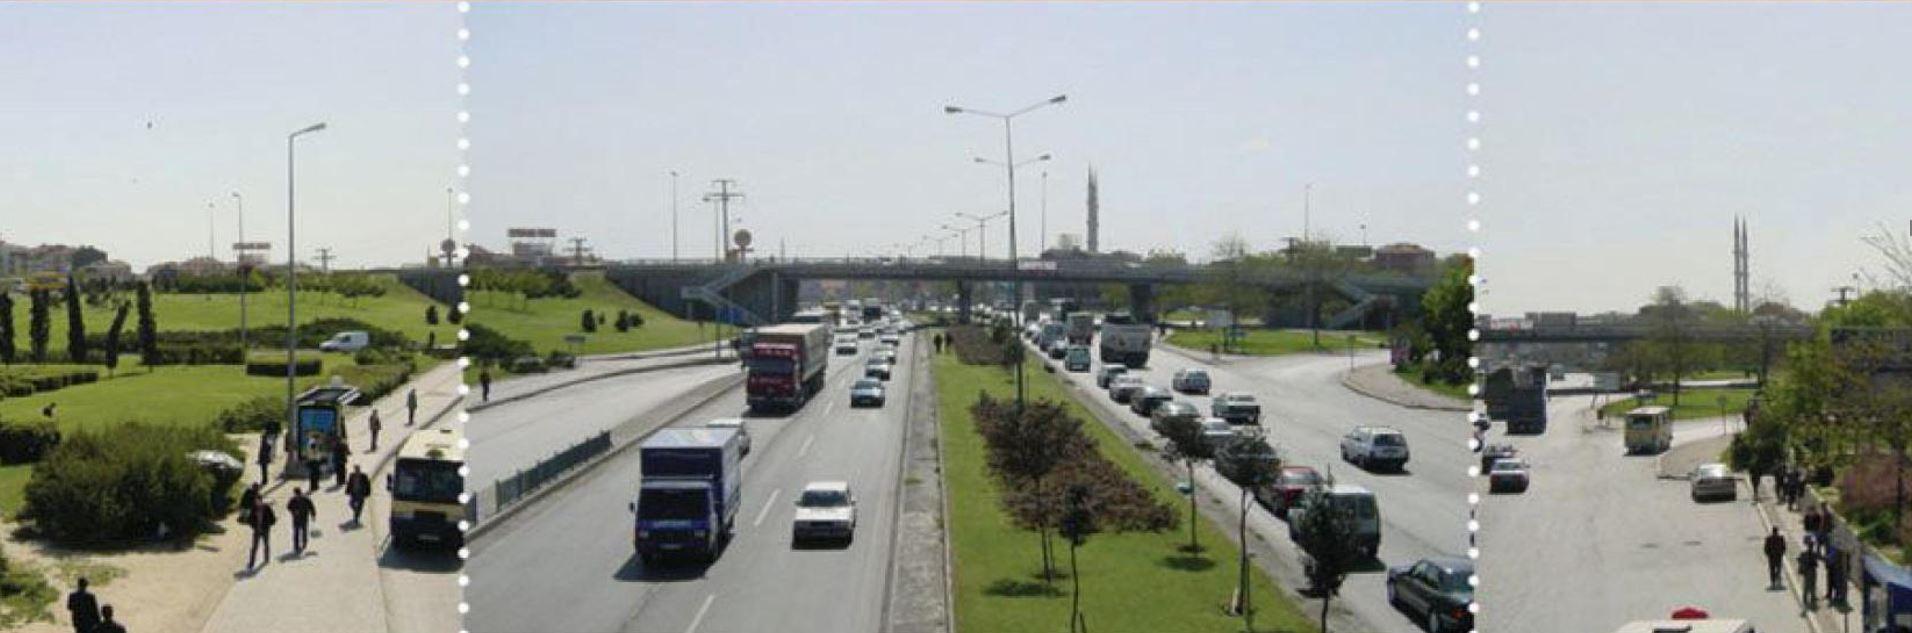 İstanbul-Sefaköy Köprülü Kavşak İnşaatı